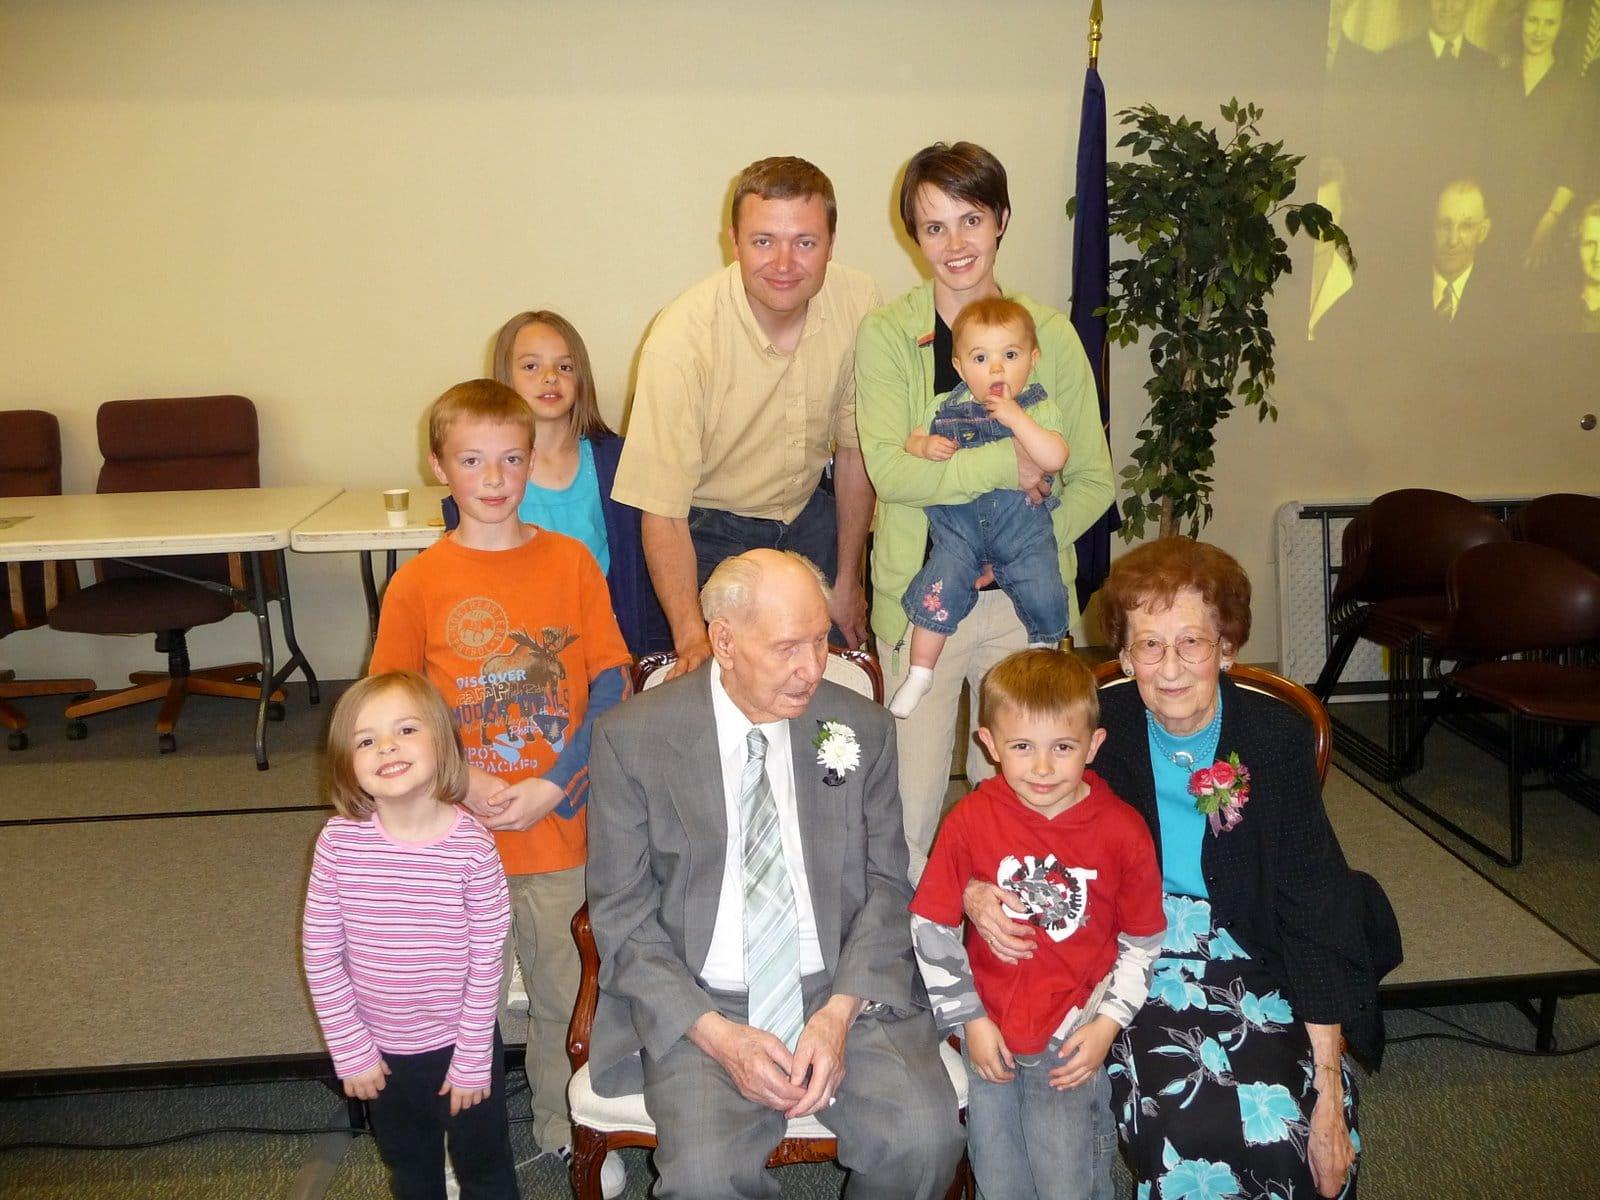 Grandpa Andreasens 101 Bash Photo